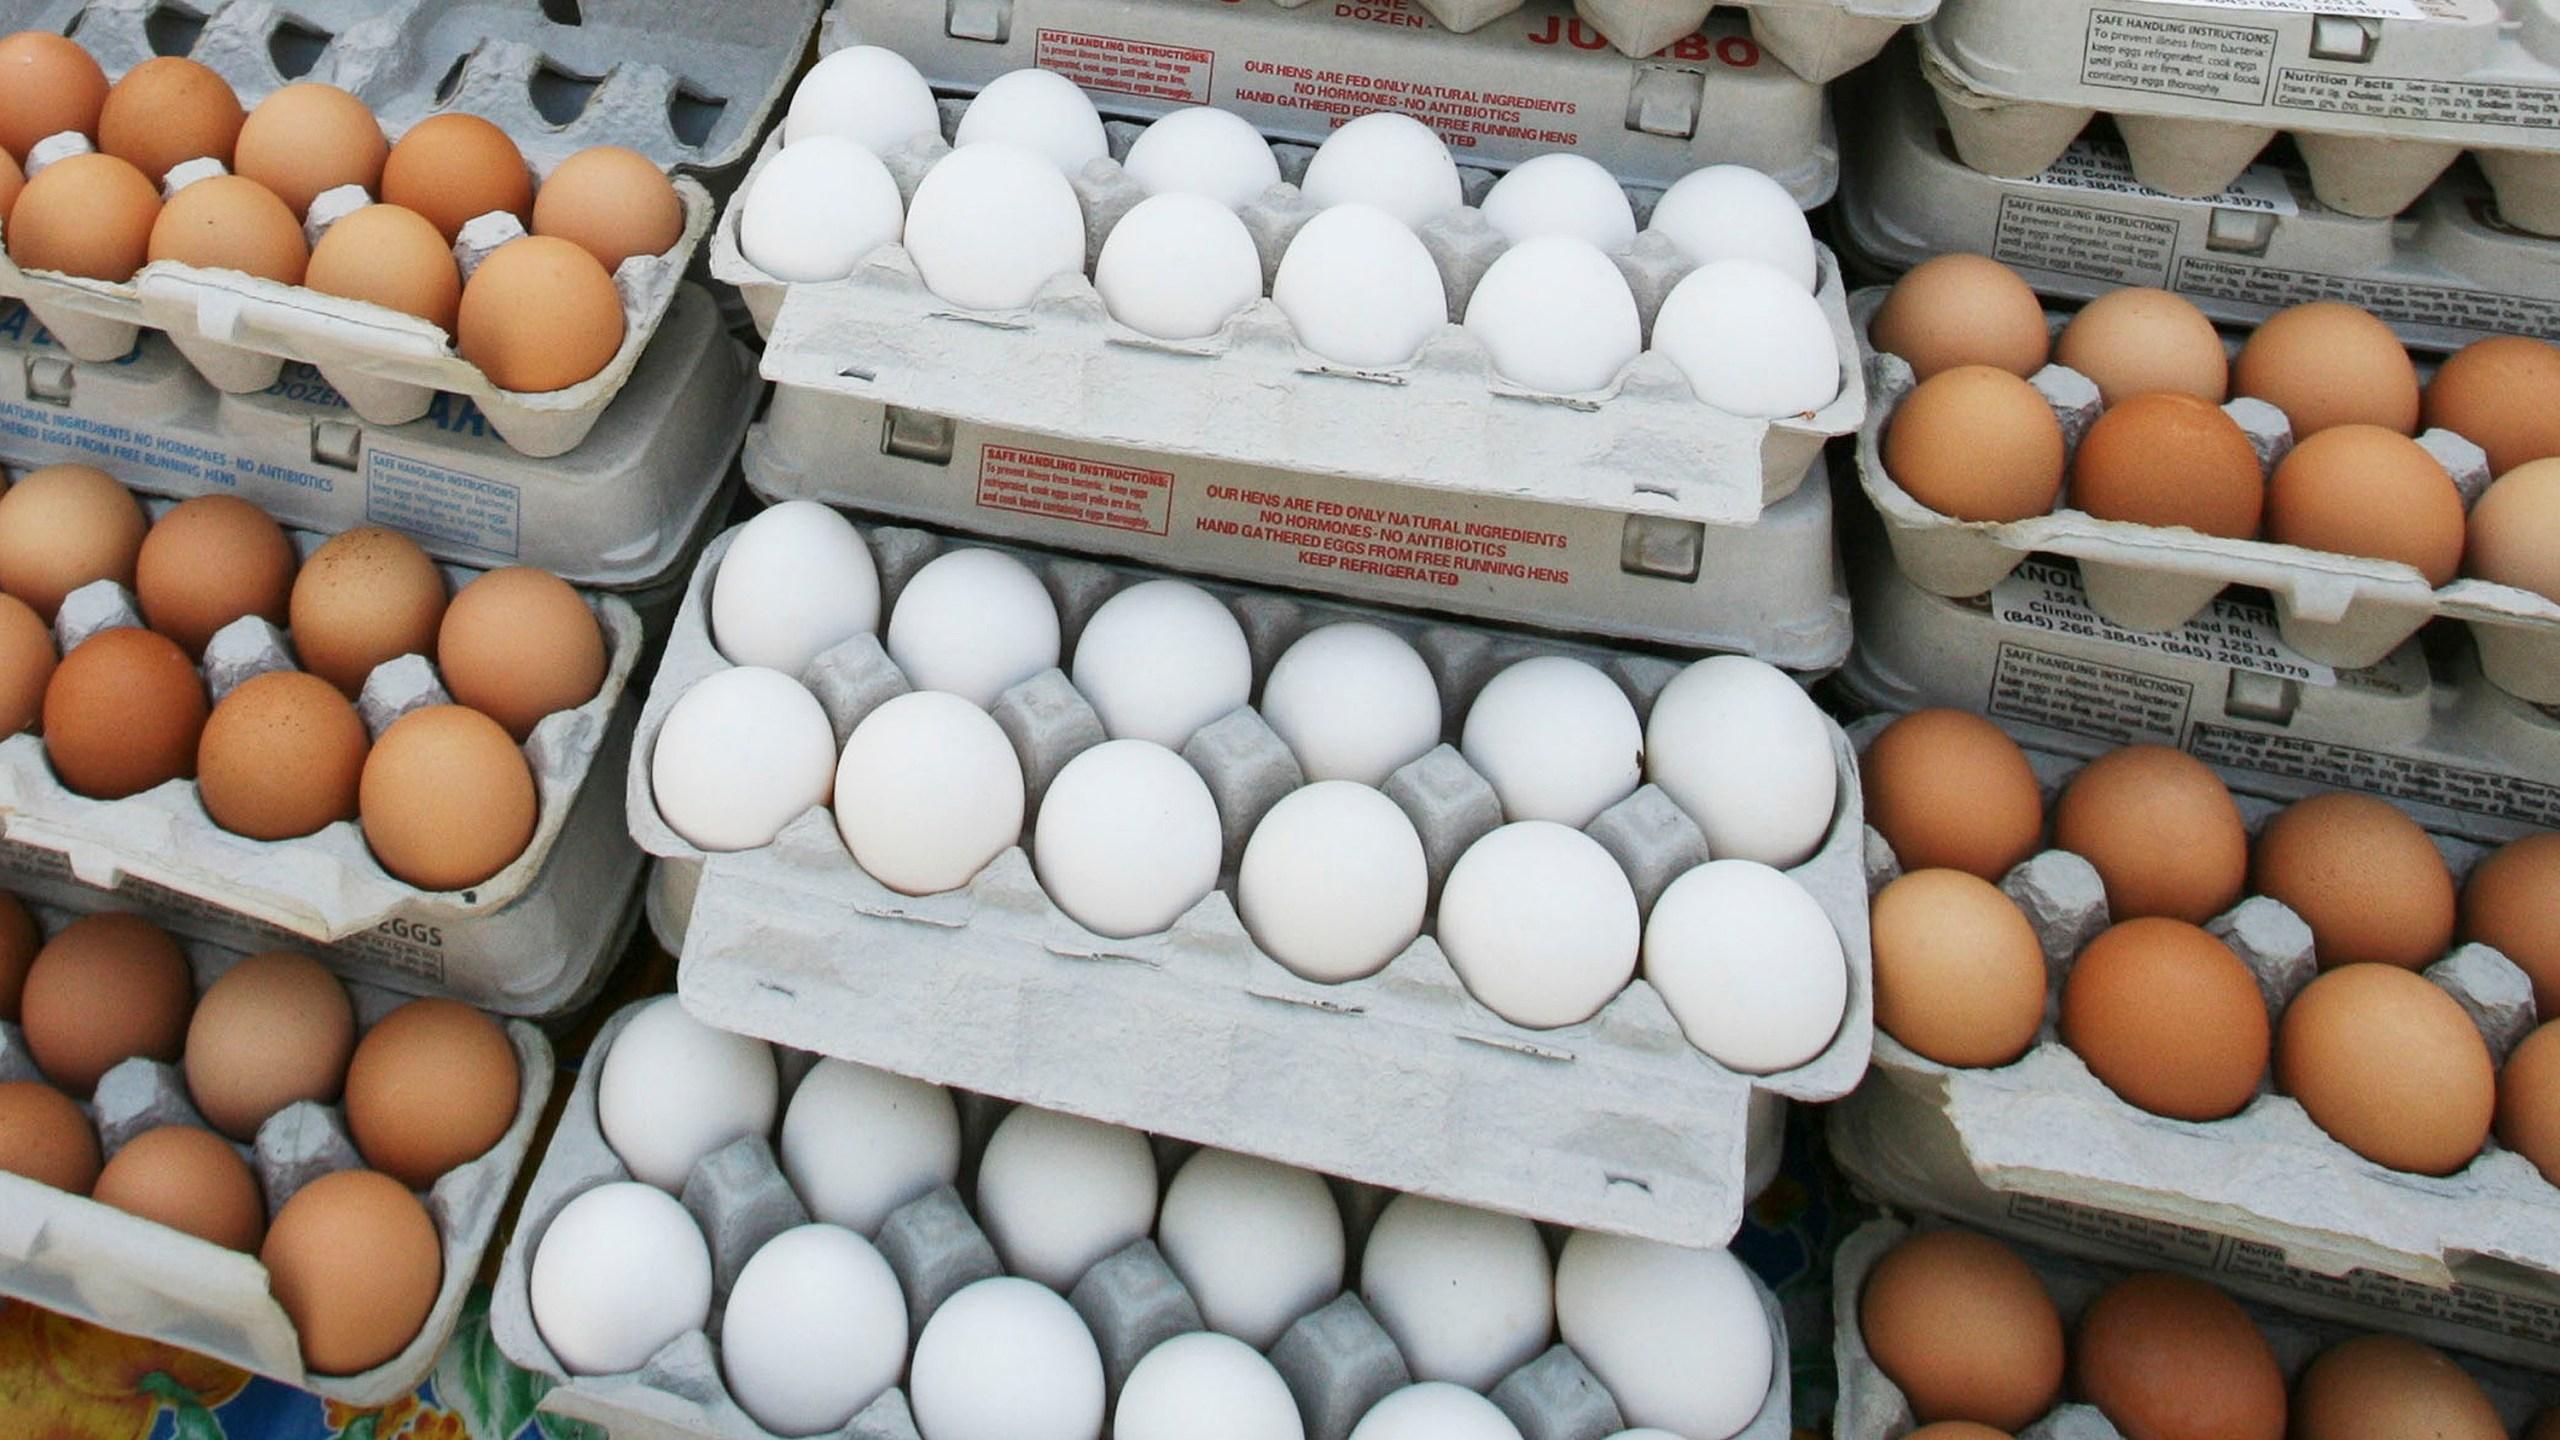 Eggs_Health_68117-159532.jpg42749745